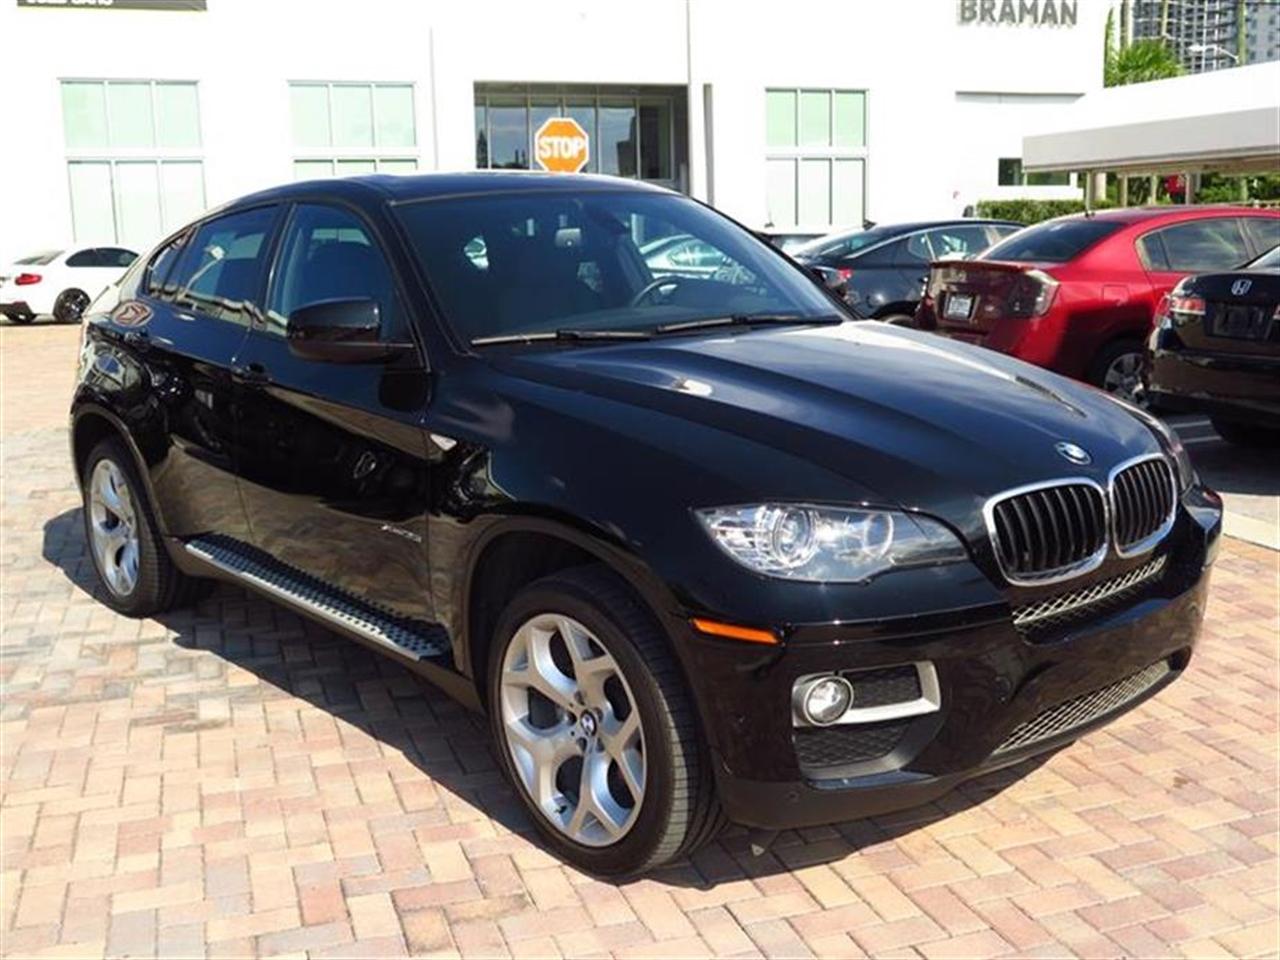 2013 BMW X6 AWD 4dr xDrive35i 42936 miles 10-way power front bucket seats -inc driver seat memor